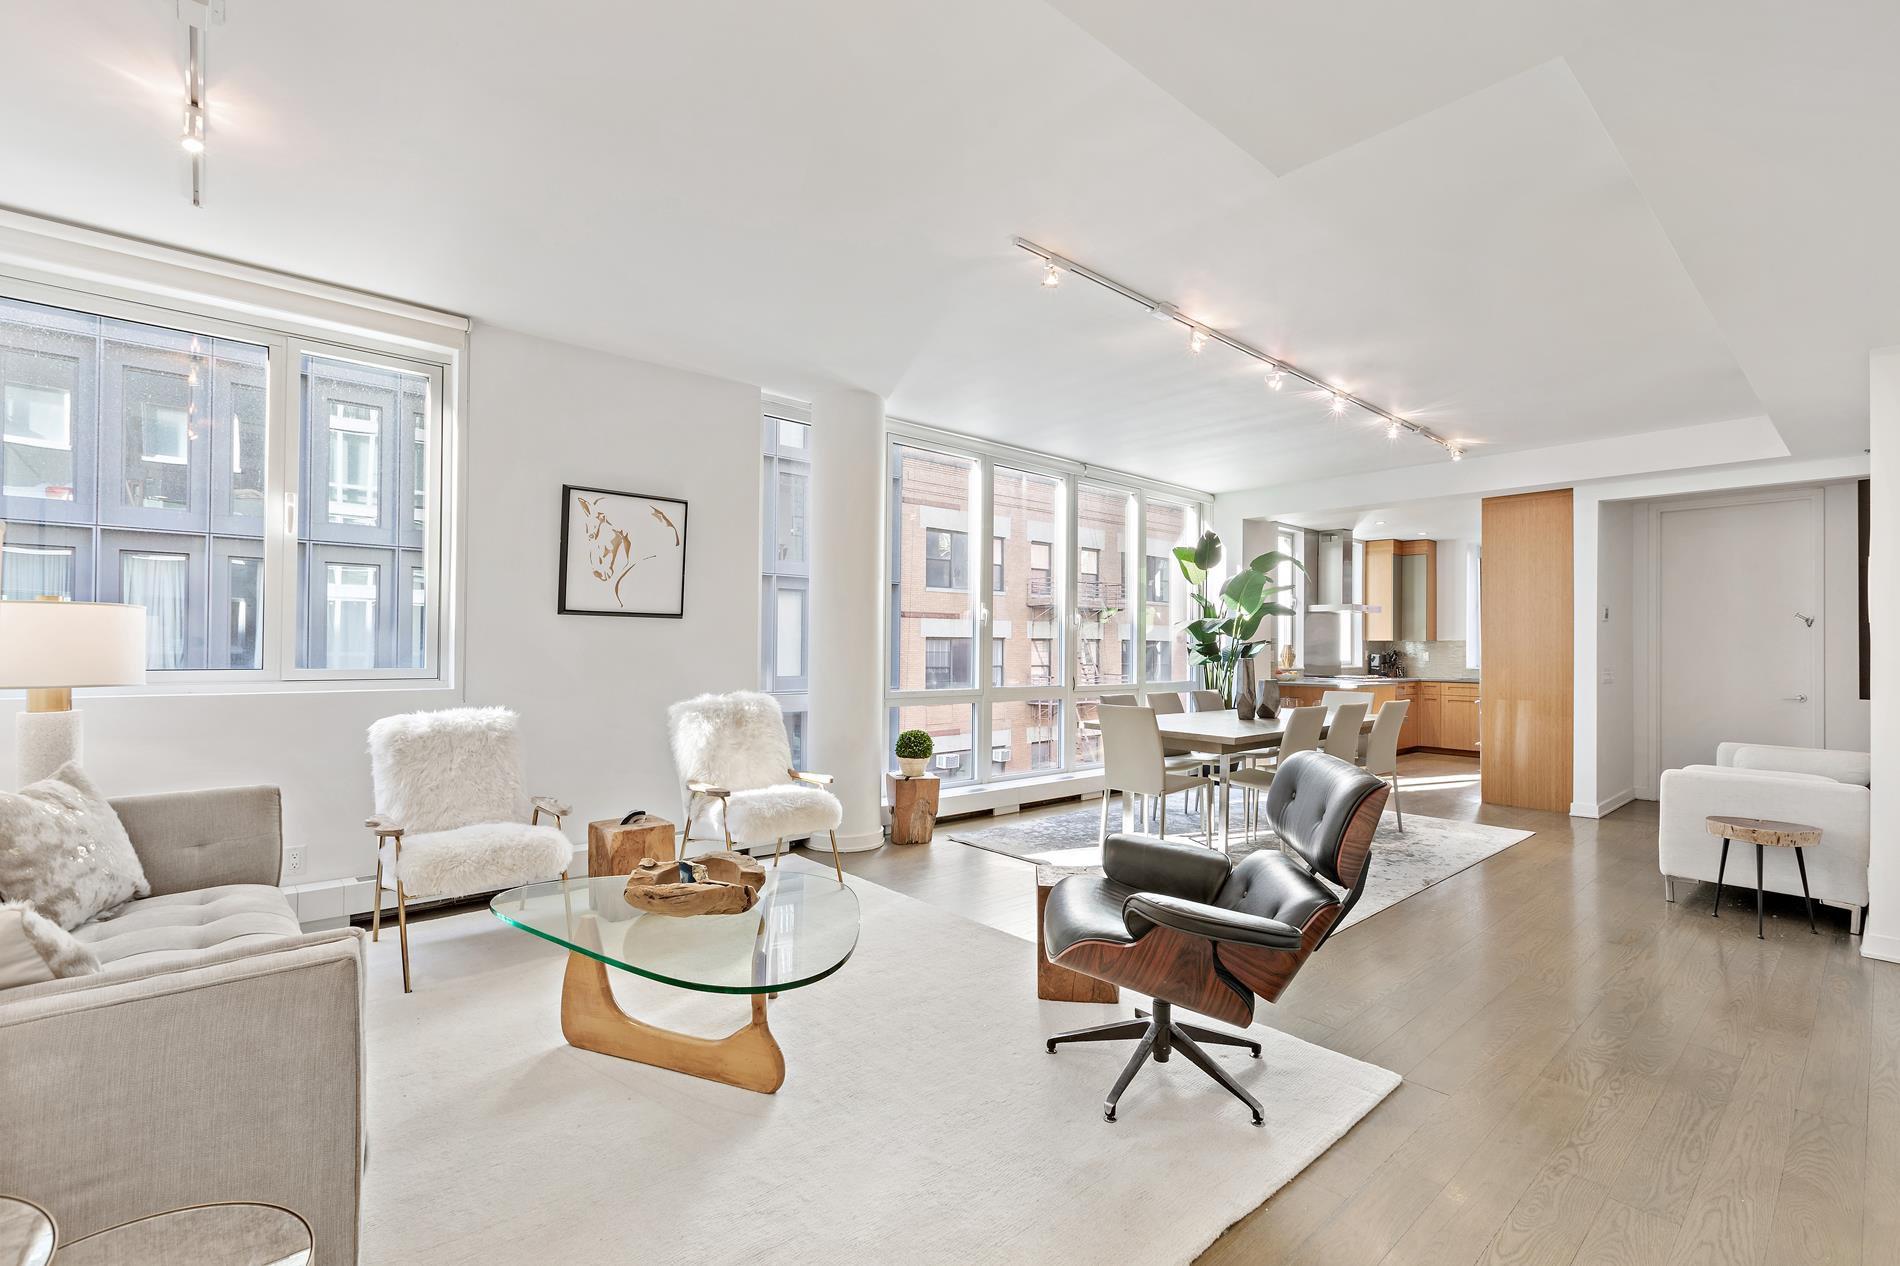 Renwick Modern, 22 RENWICK ST   Apartments for Sale & Rent ...